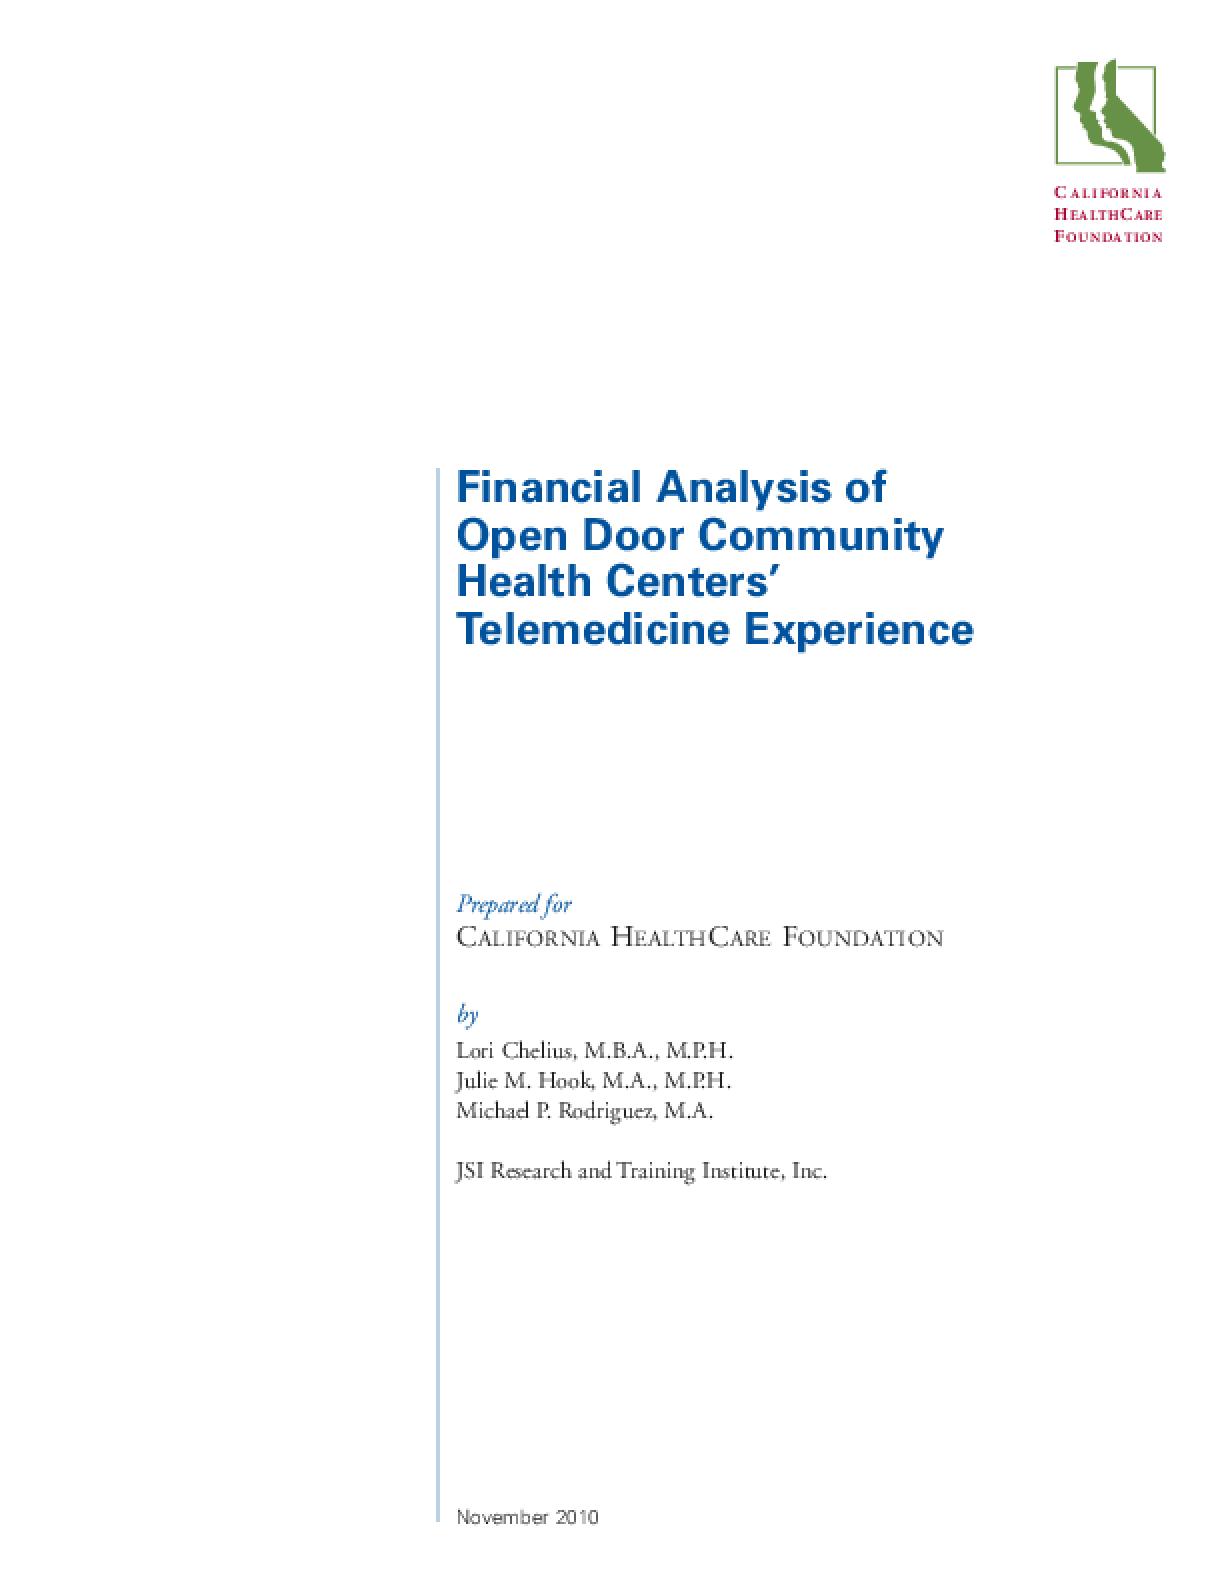 Financial Analysis of Open Door Community Health Center's Telemedicine Experience